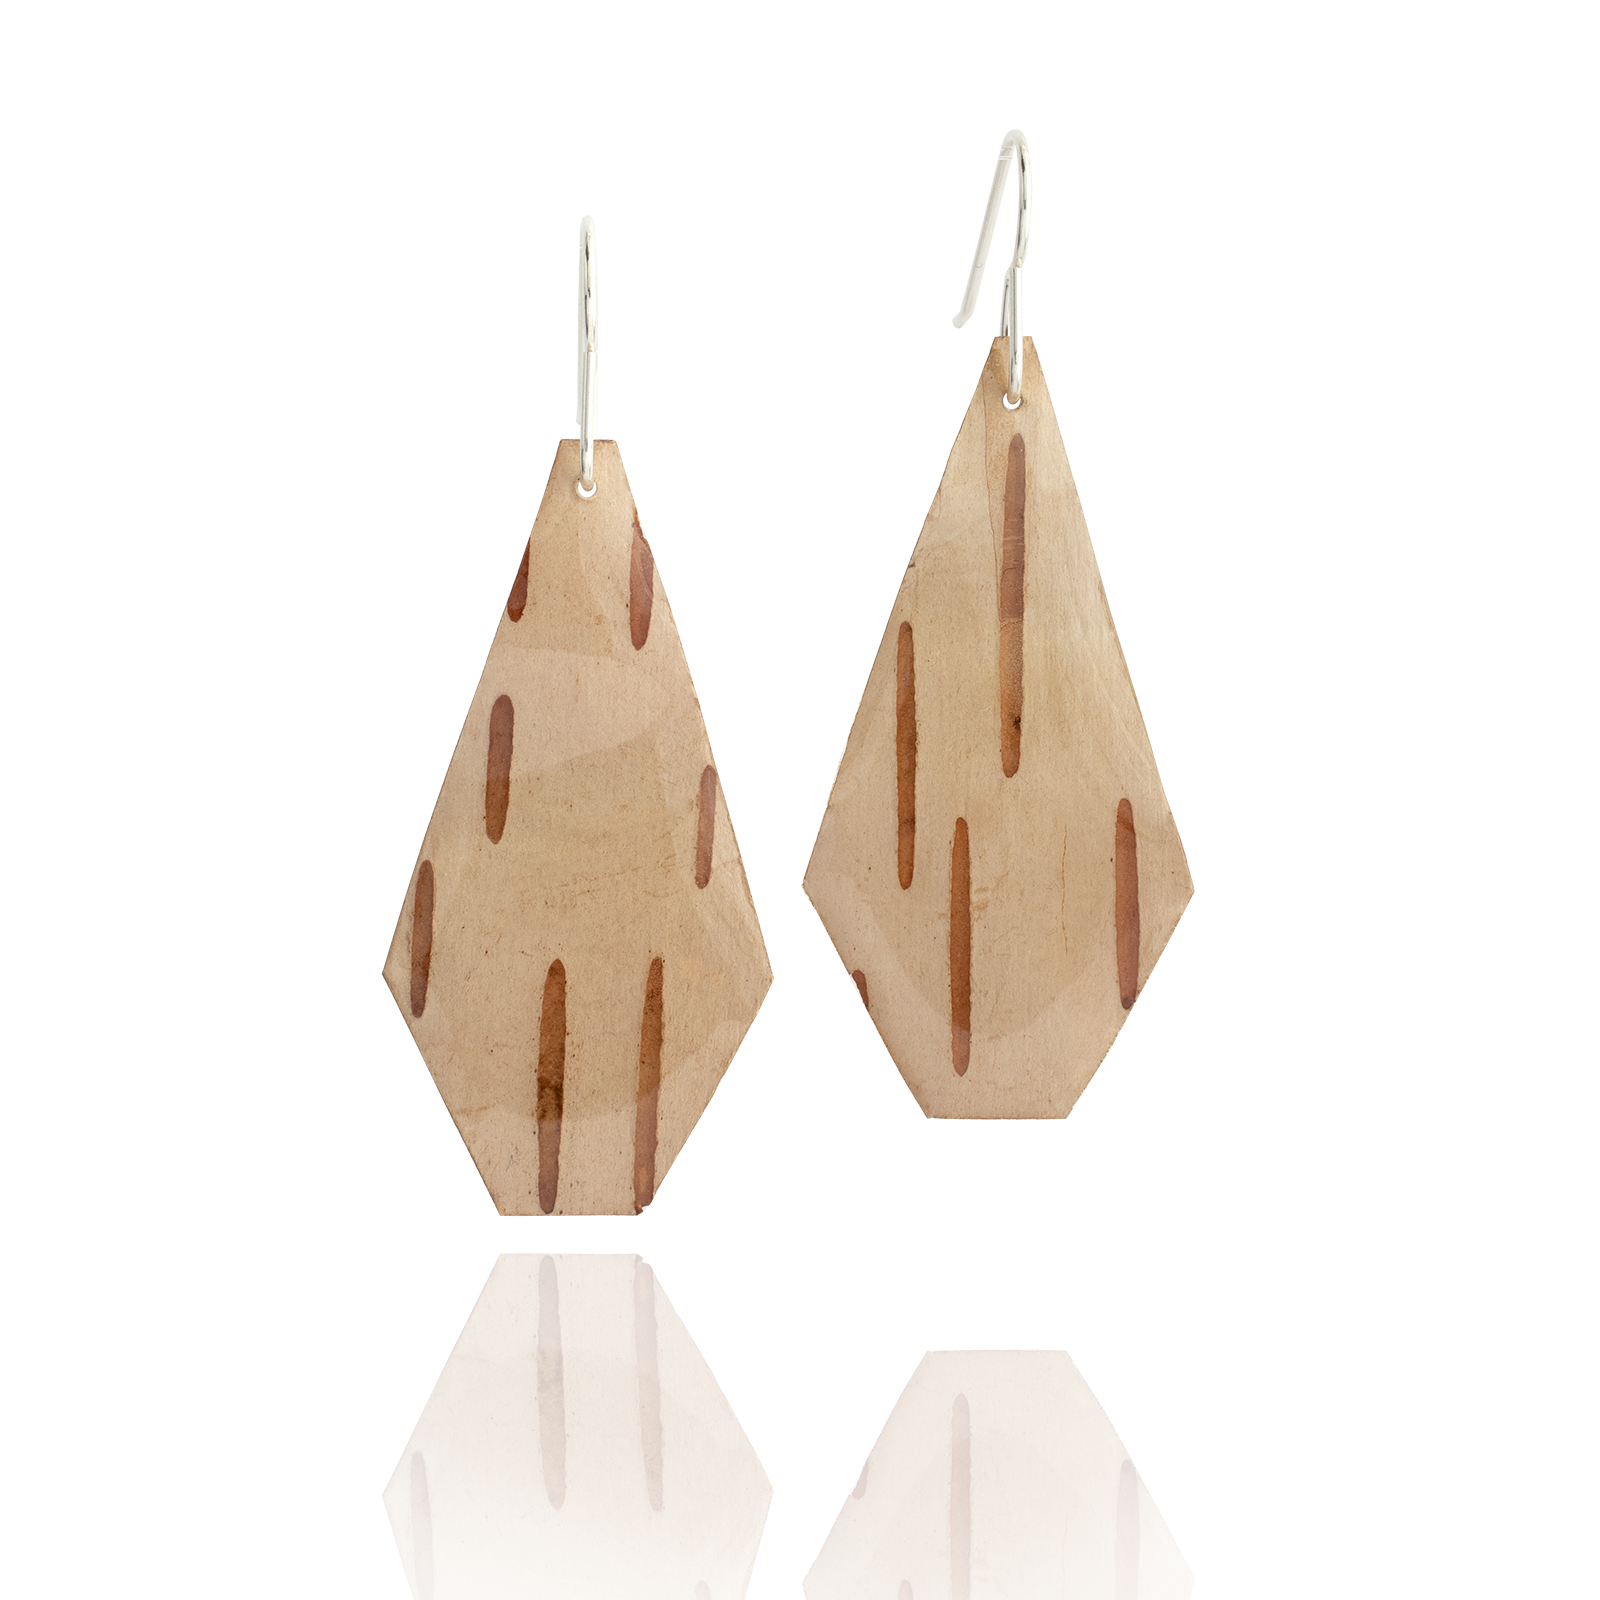 Birch Bark Dangles - Pentagon